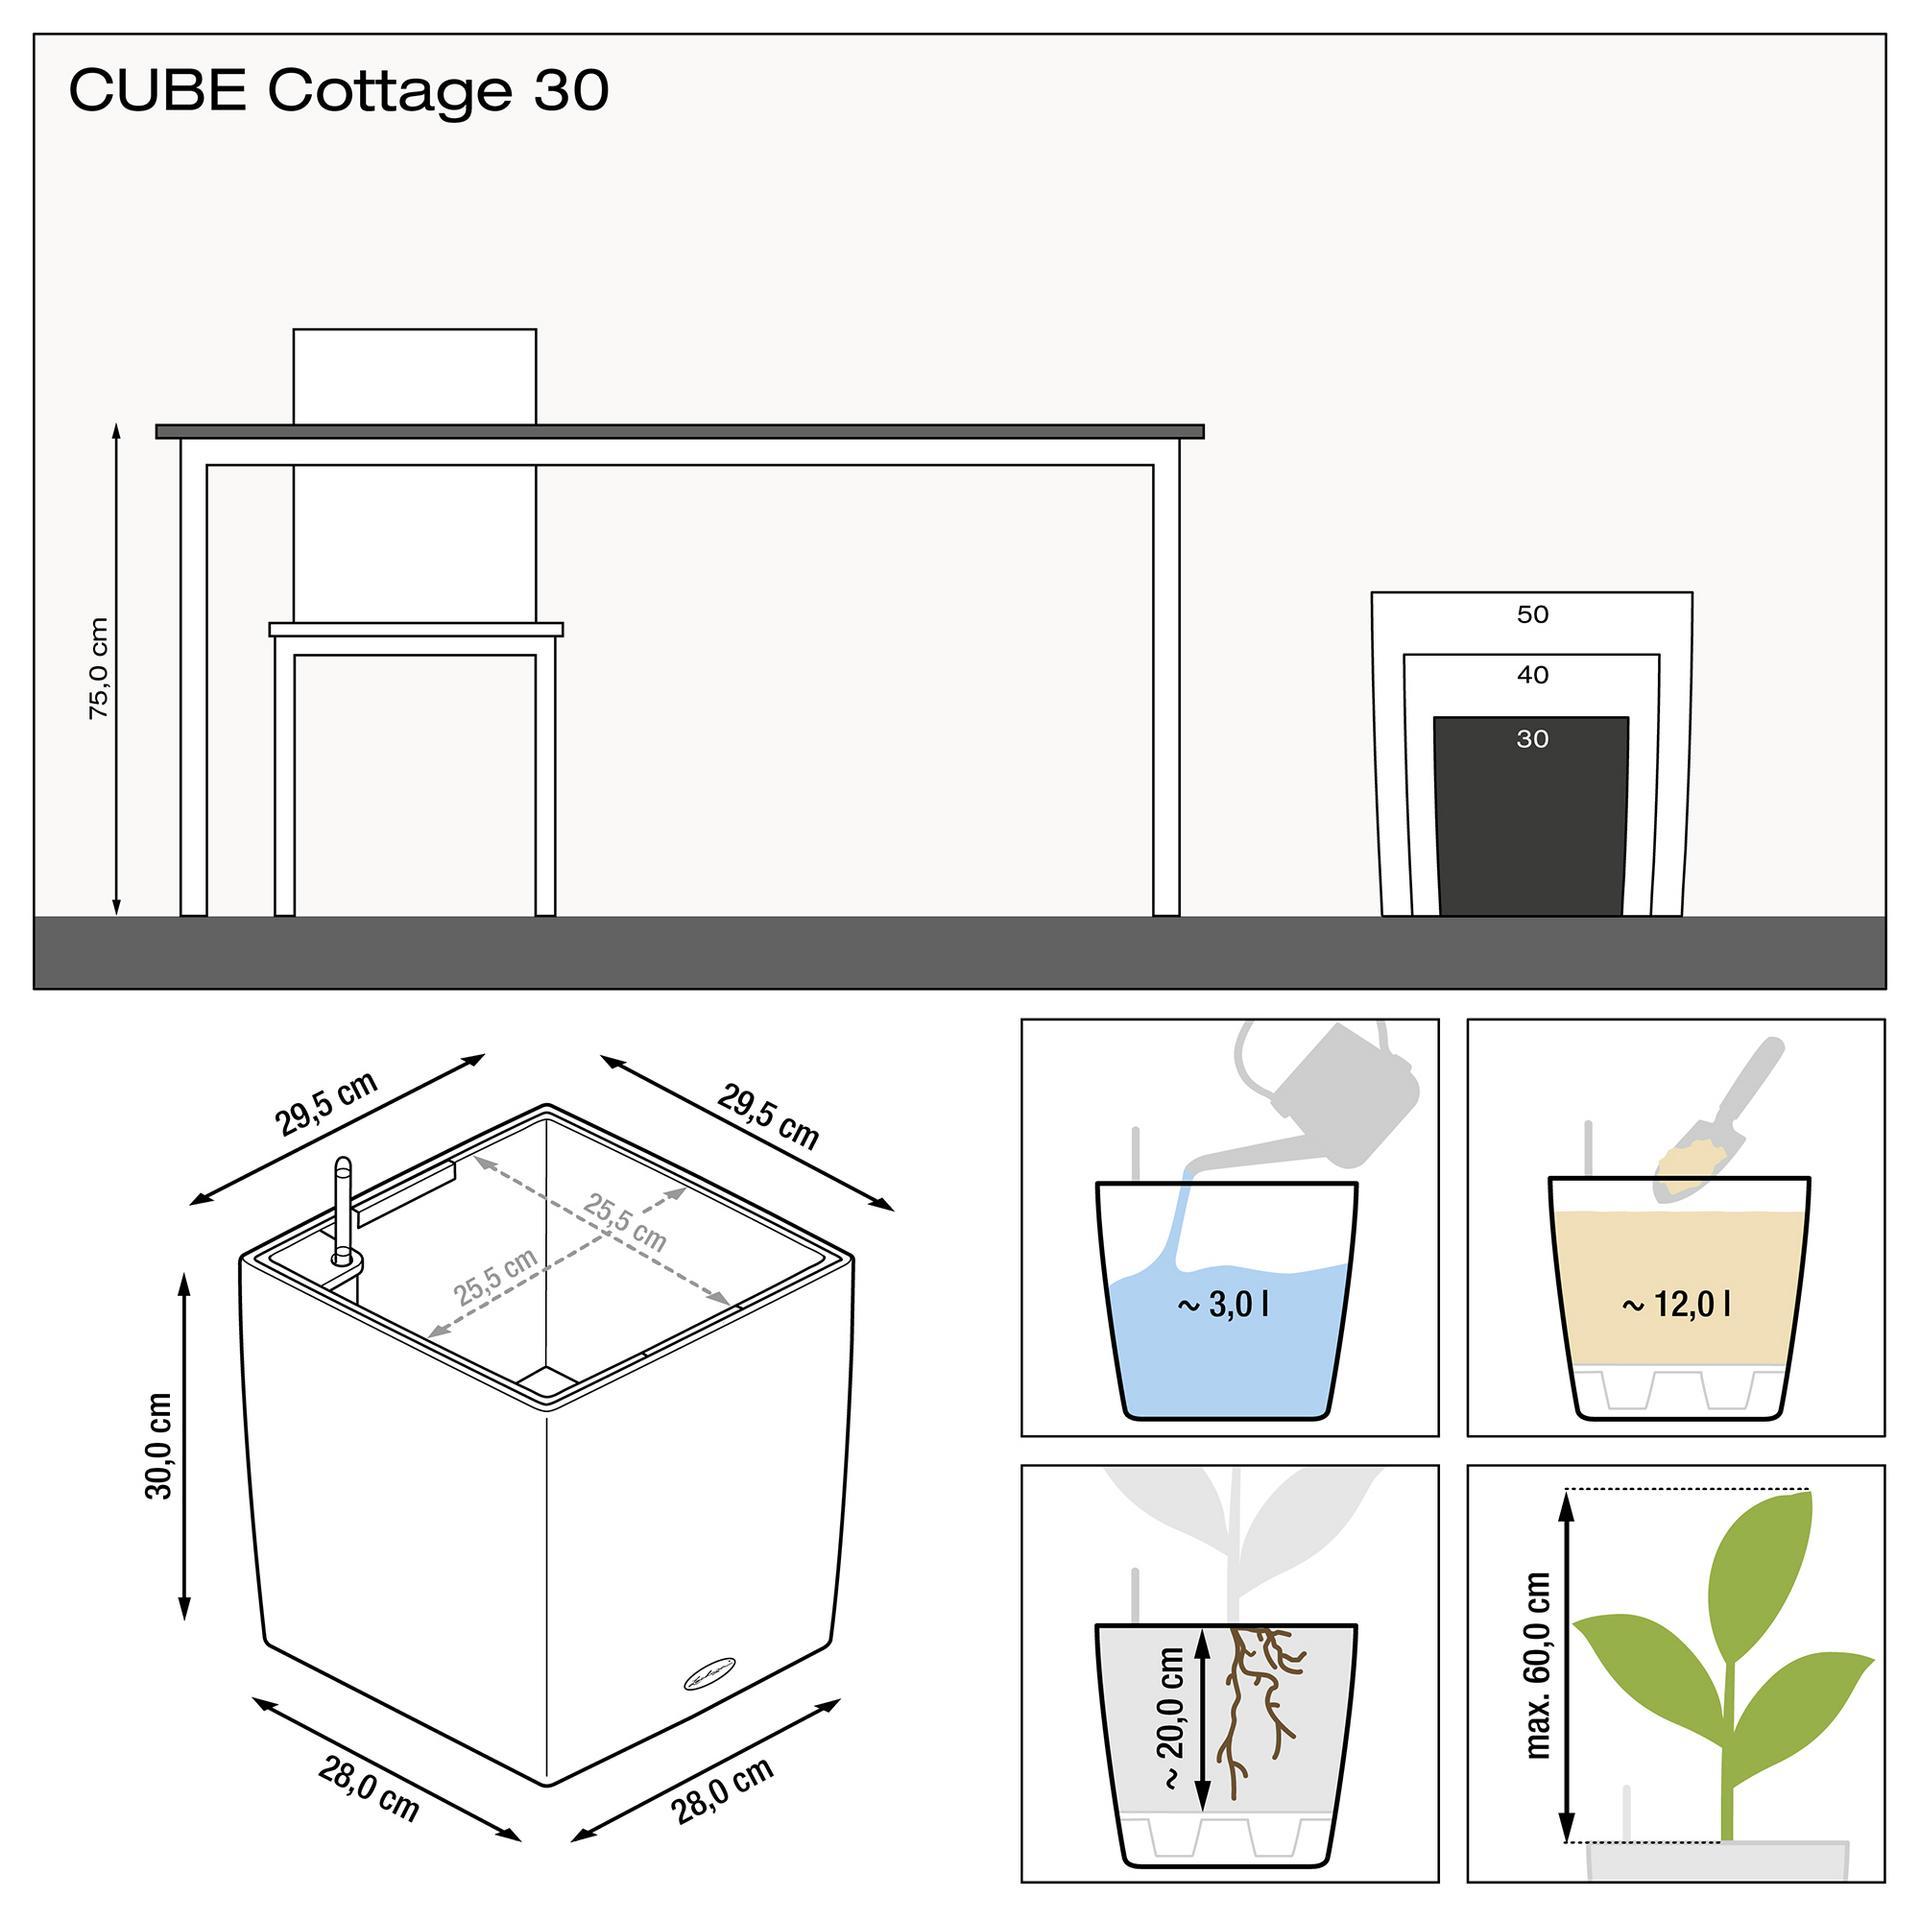 le_cube-cottage30_product_addi_nz